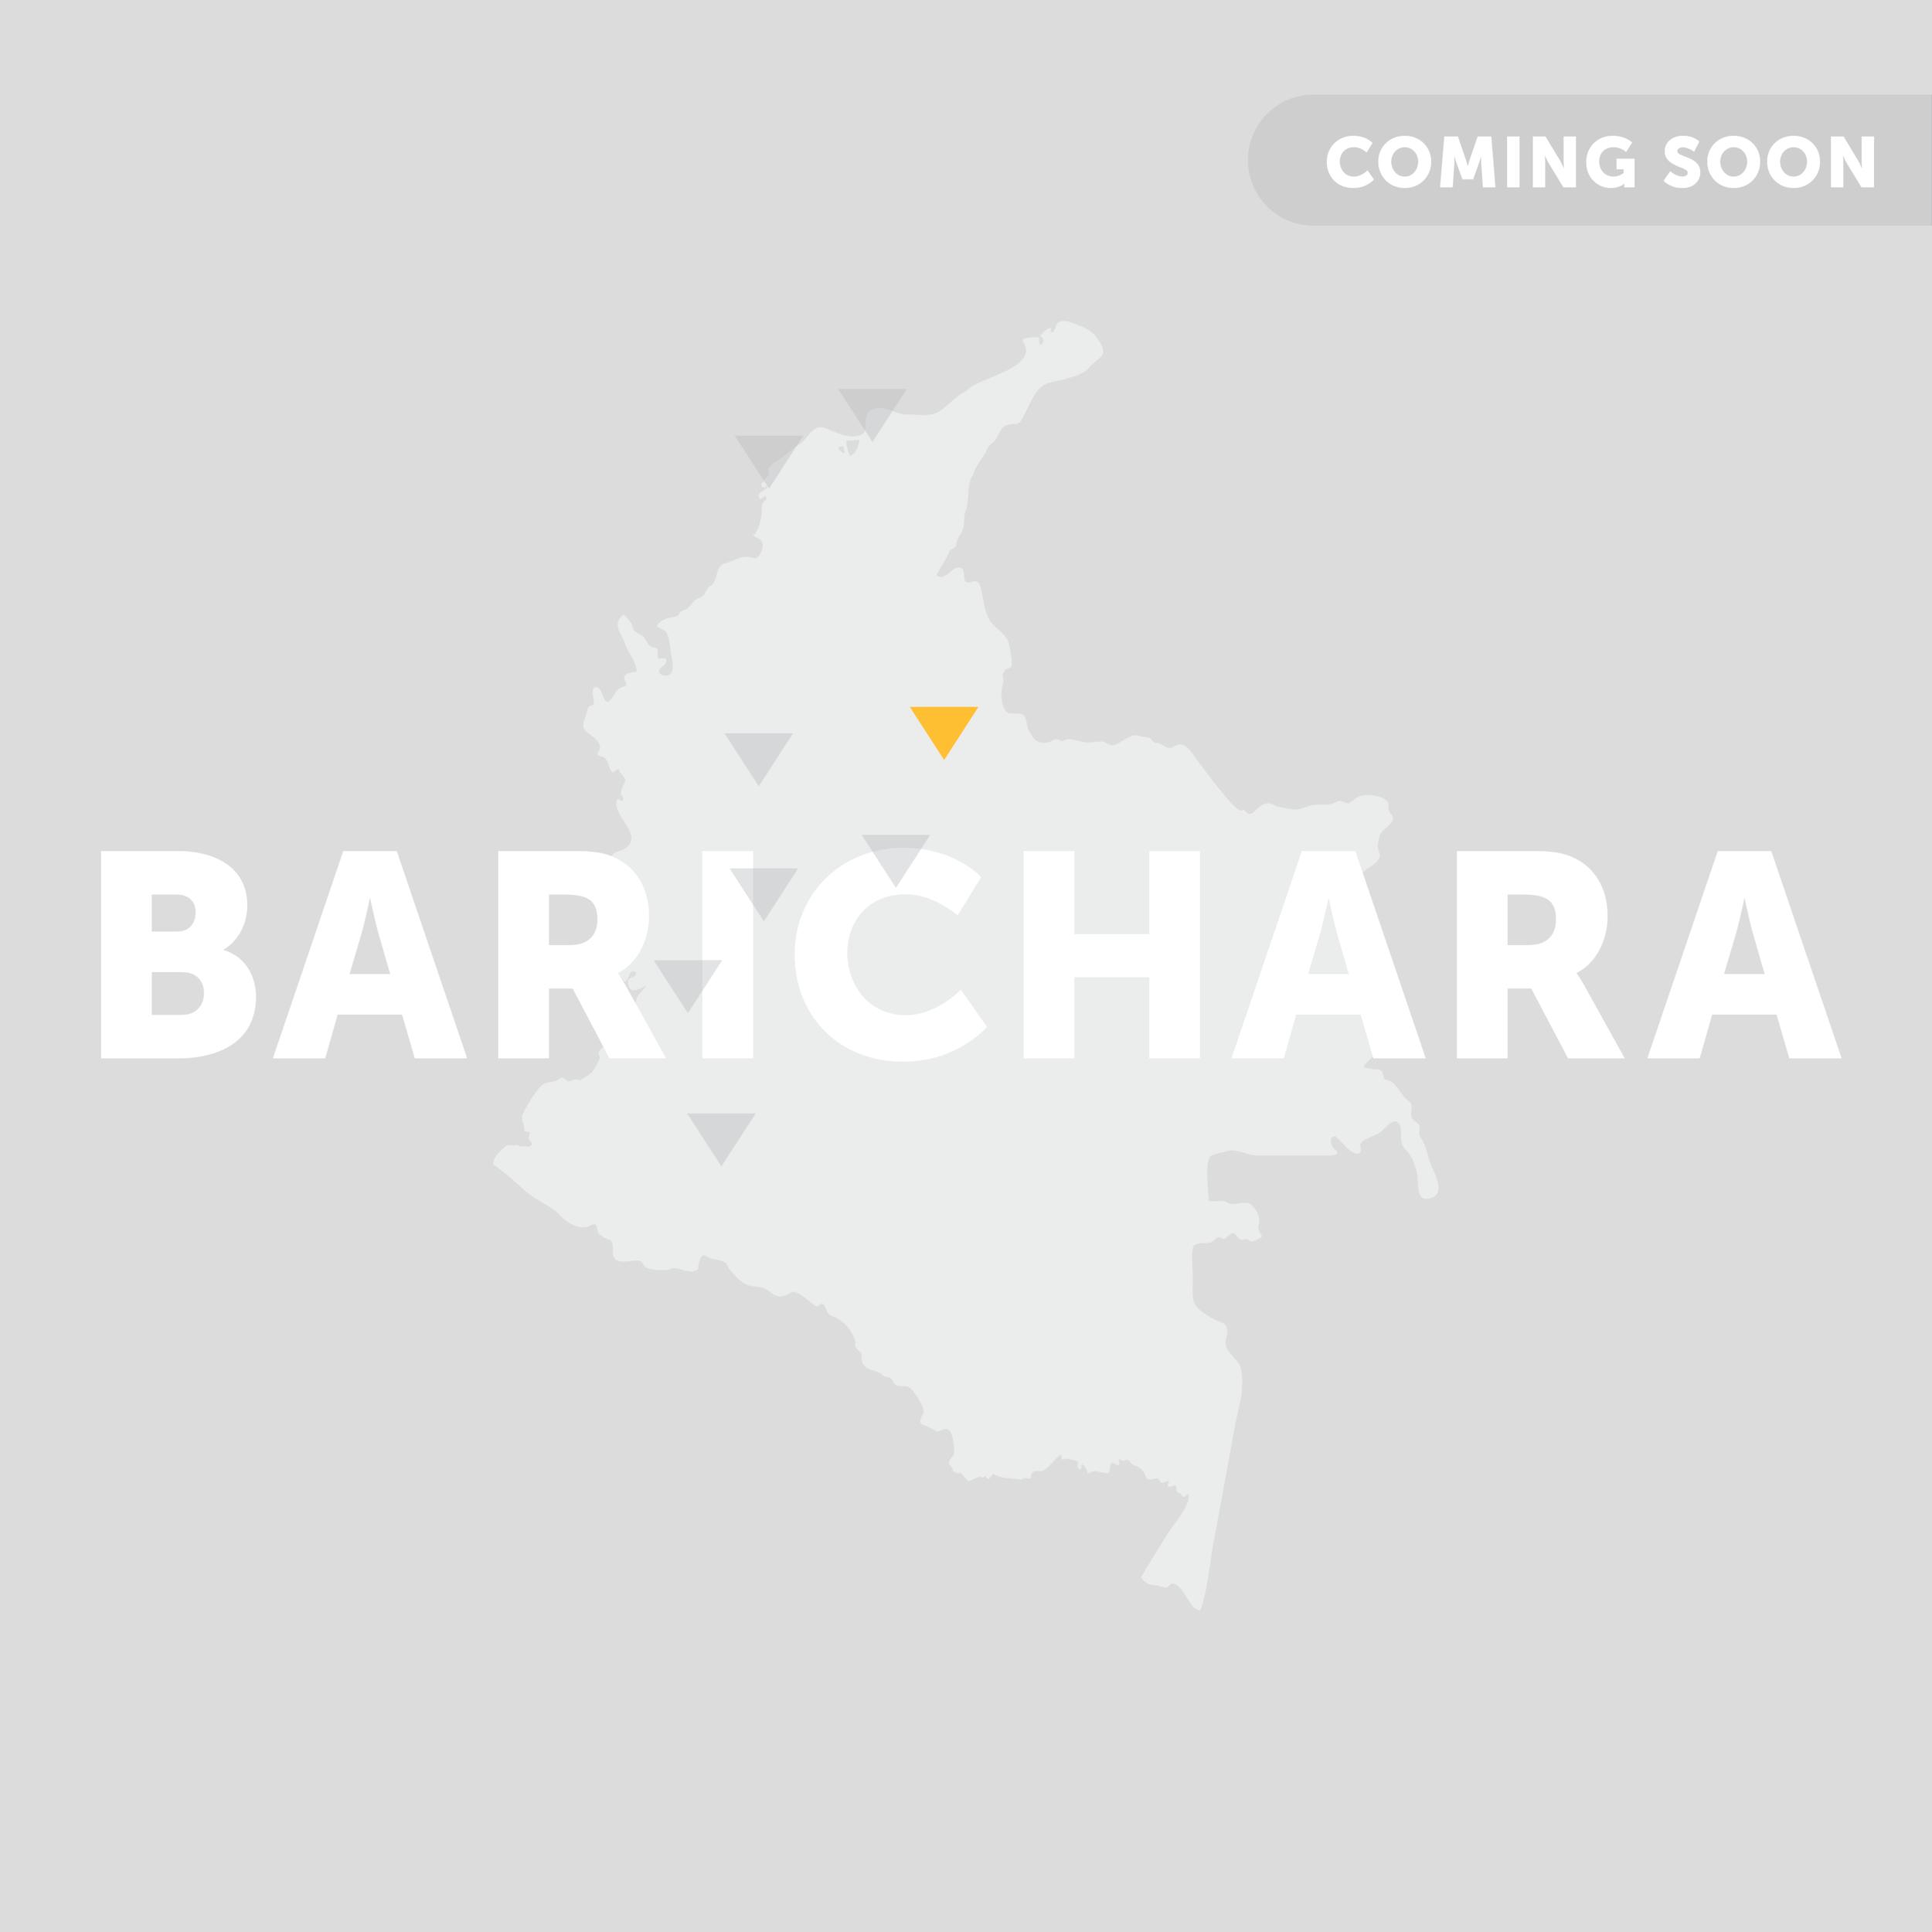 OBELO Barichara